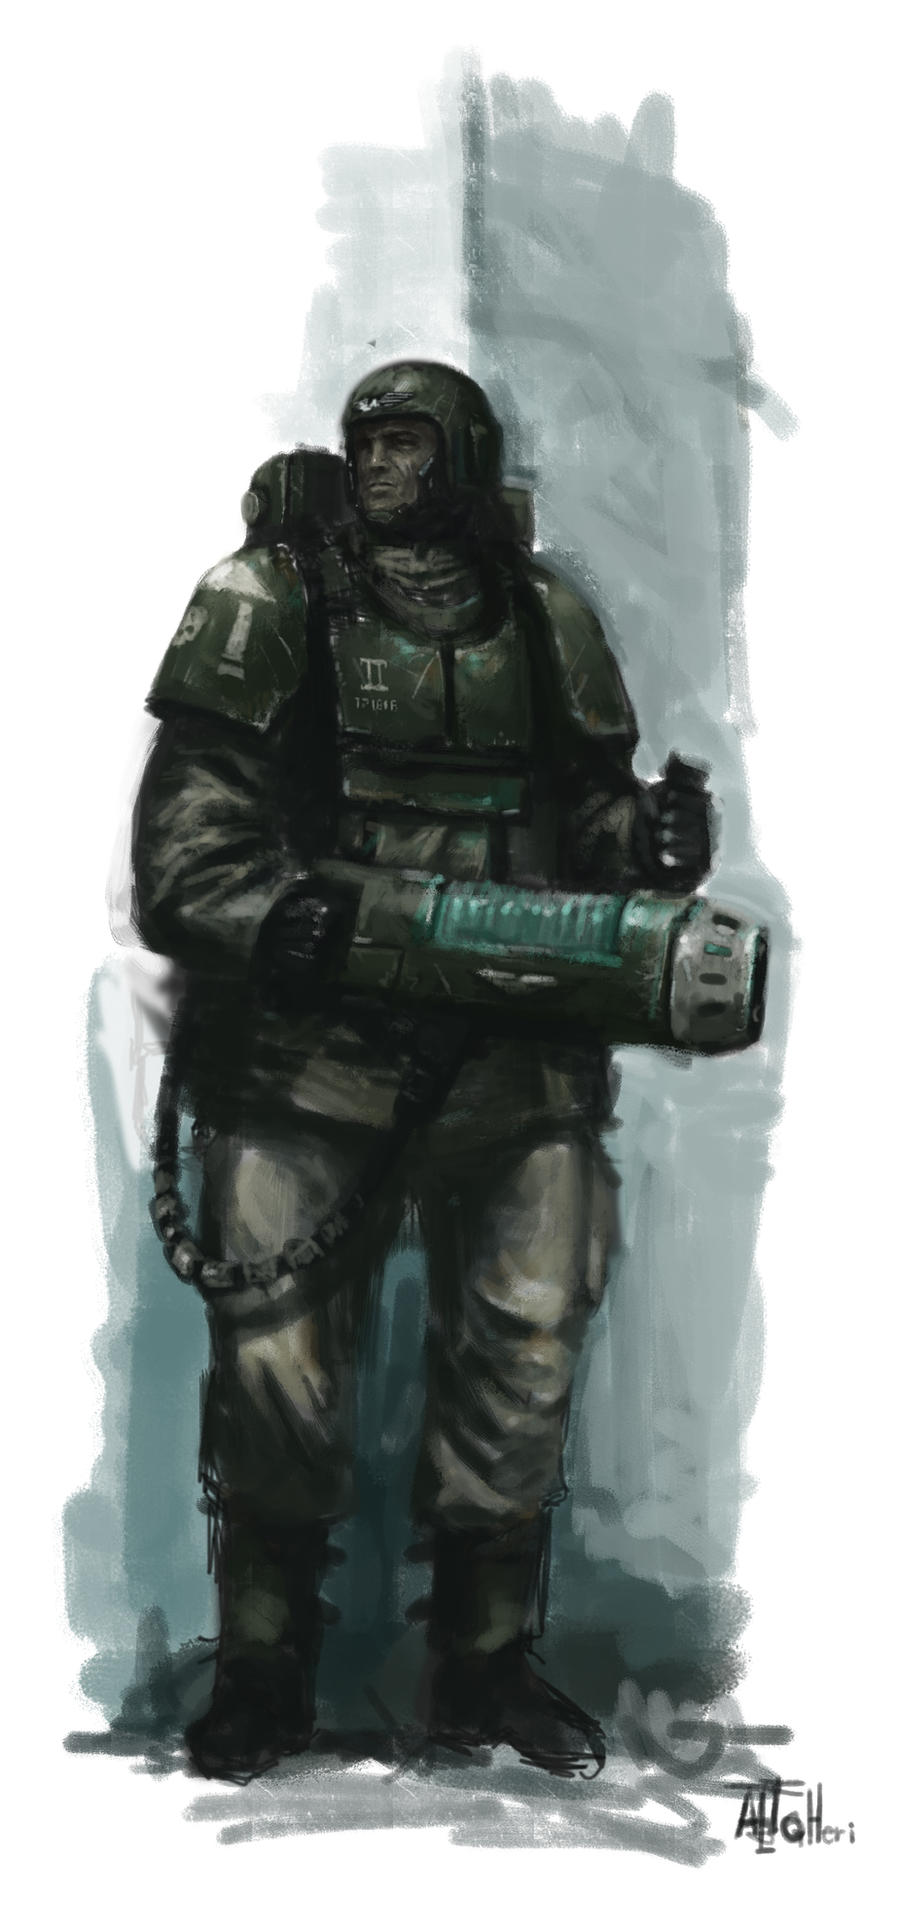 Cadian with Plasma gun by MasterAlighieri